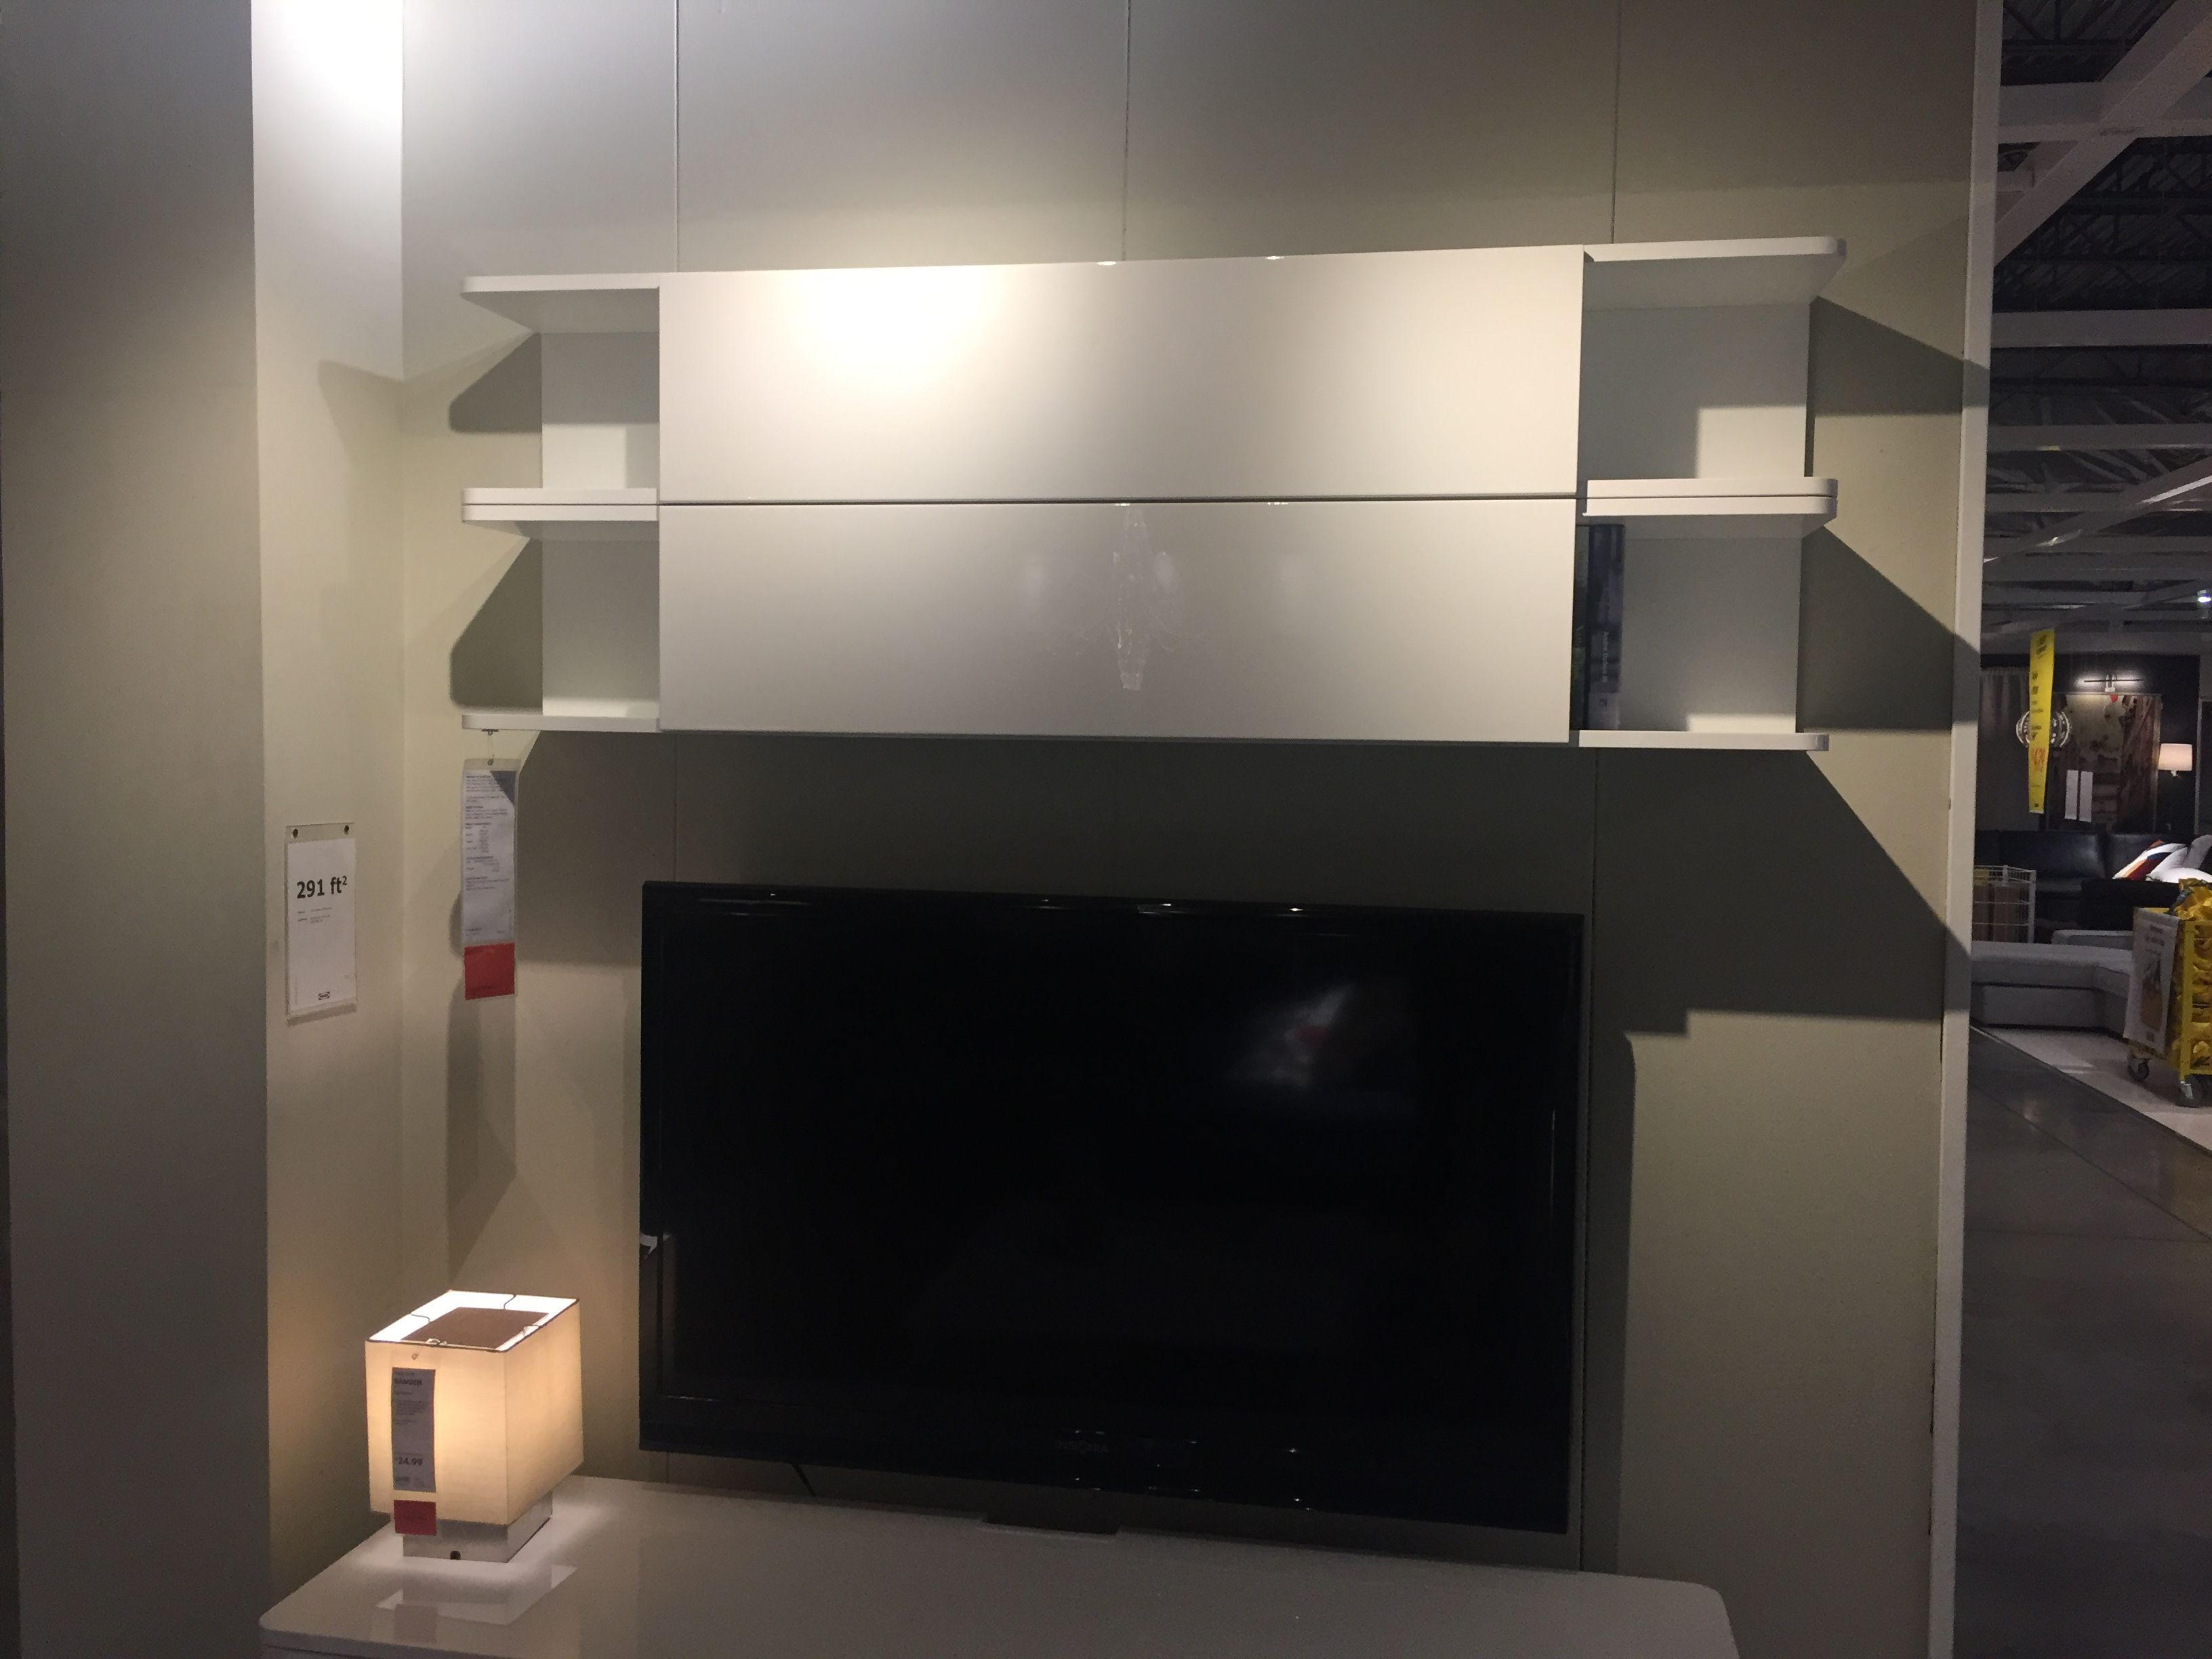 mostorp wall shelf ikea 109 master bedroom pinterest